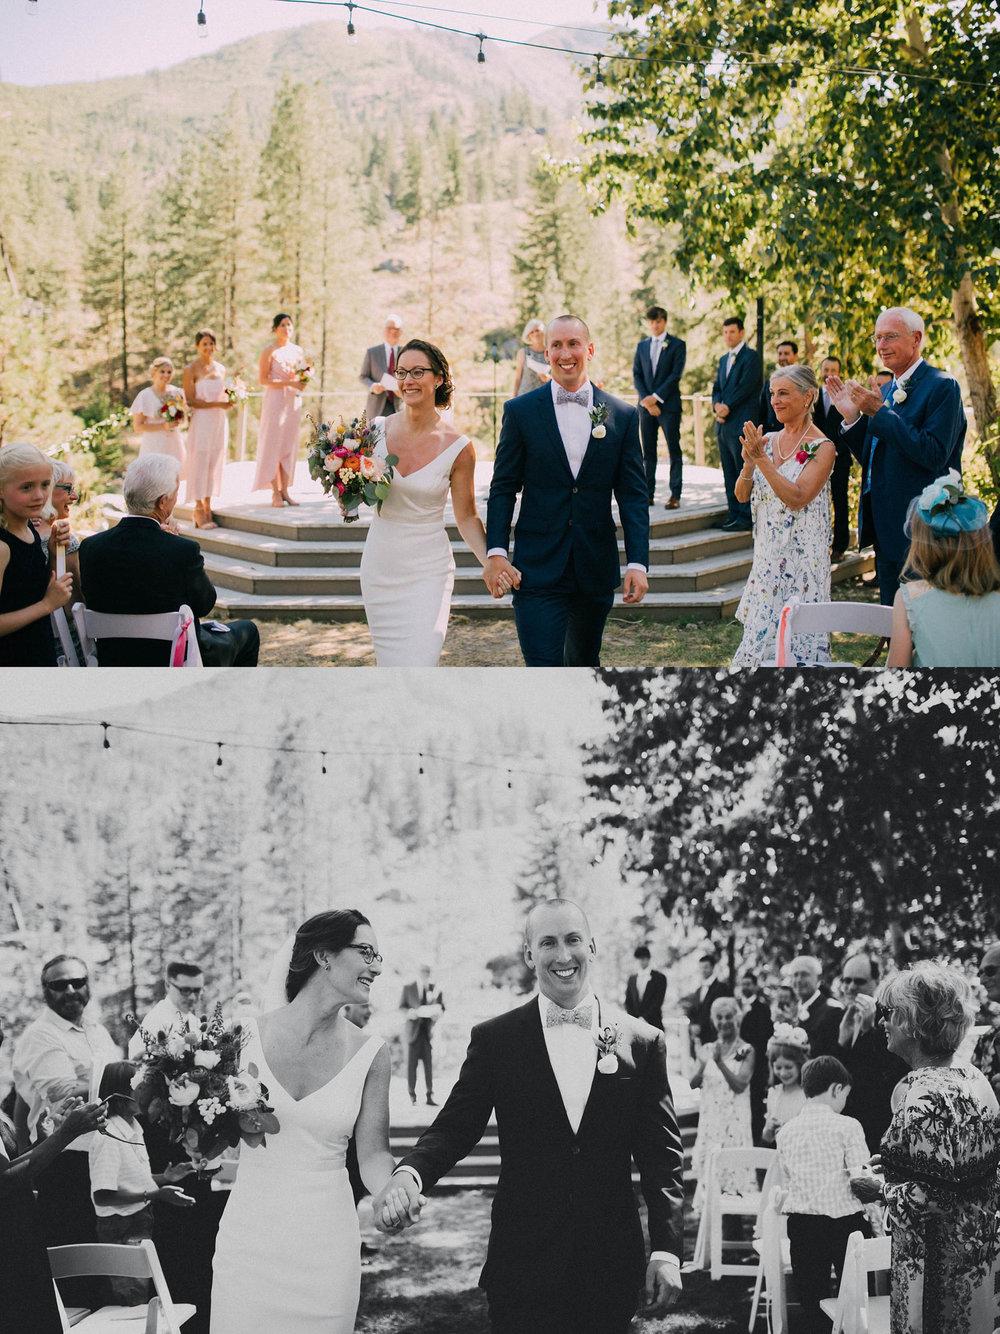 seattle+and+pacific+northwest+wedding+photographer+western+washington+wedding-11.jpg